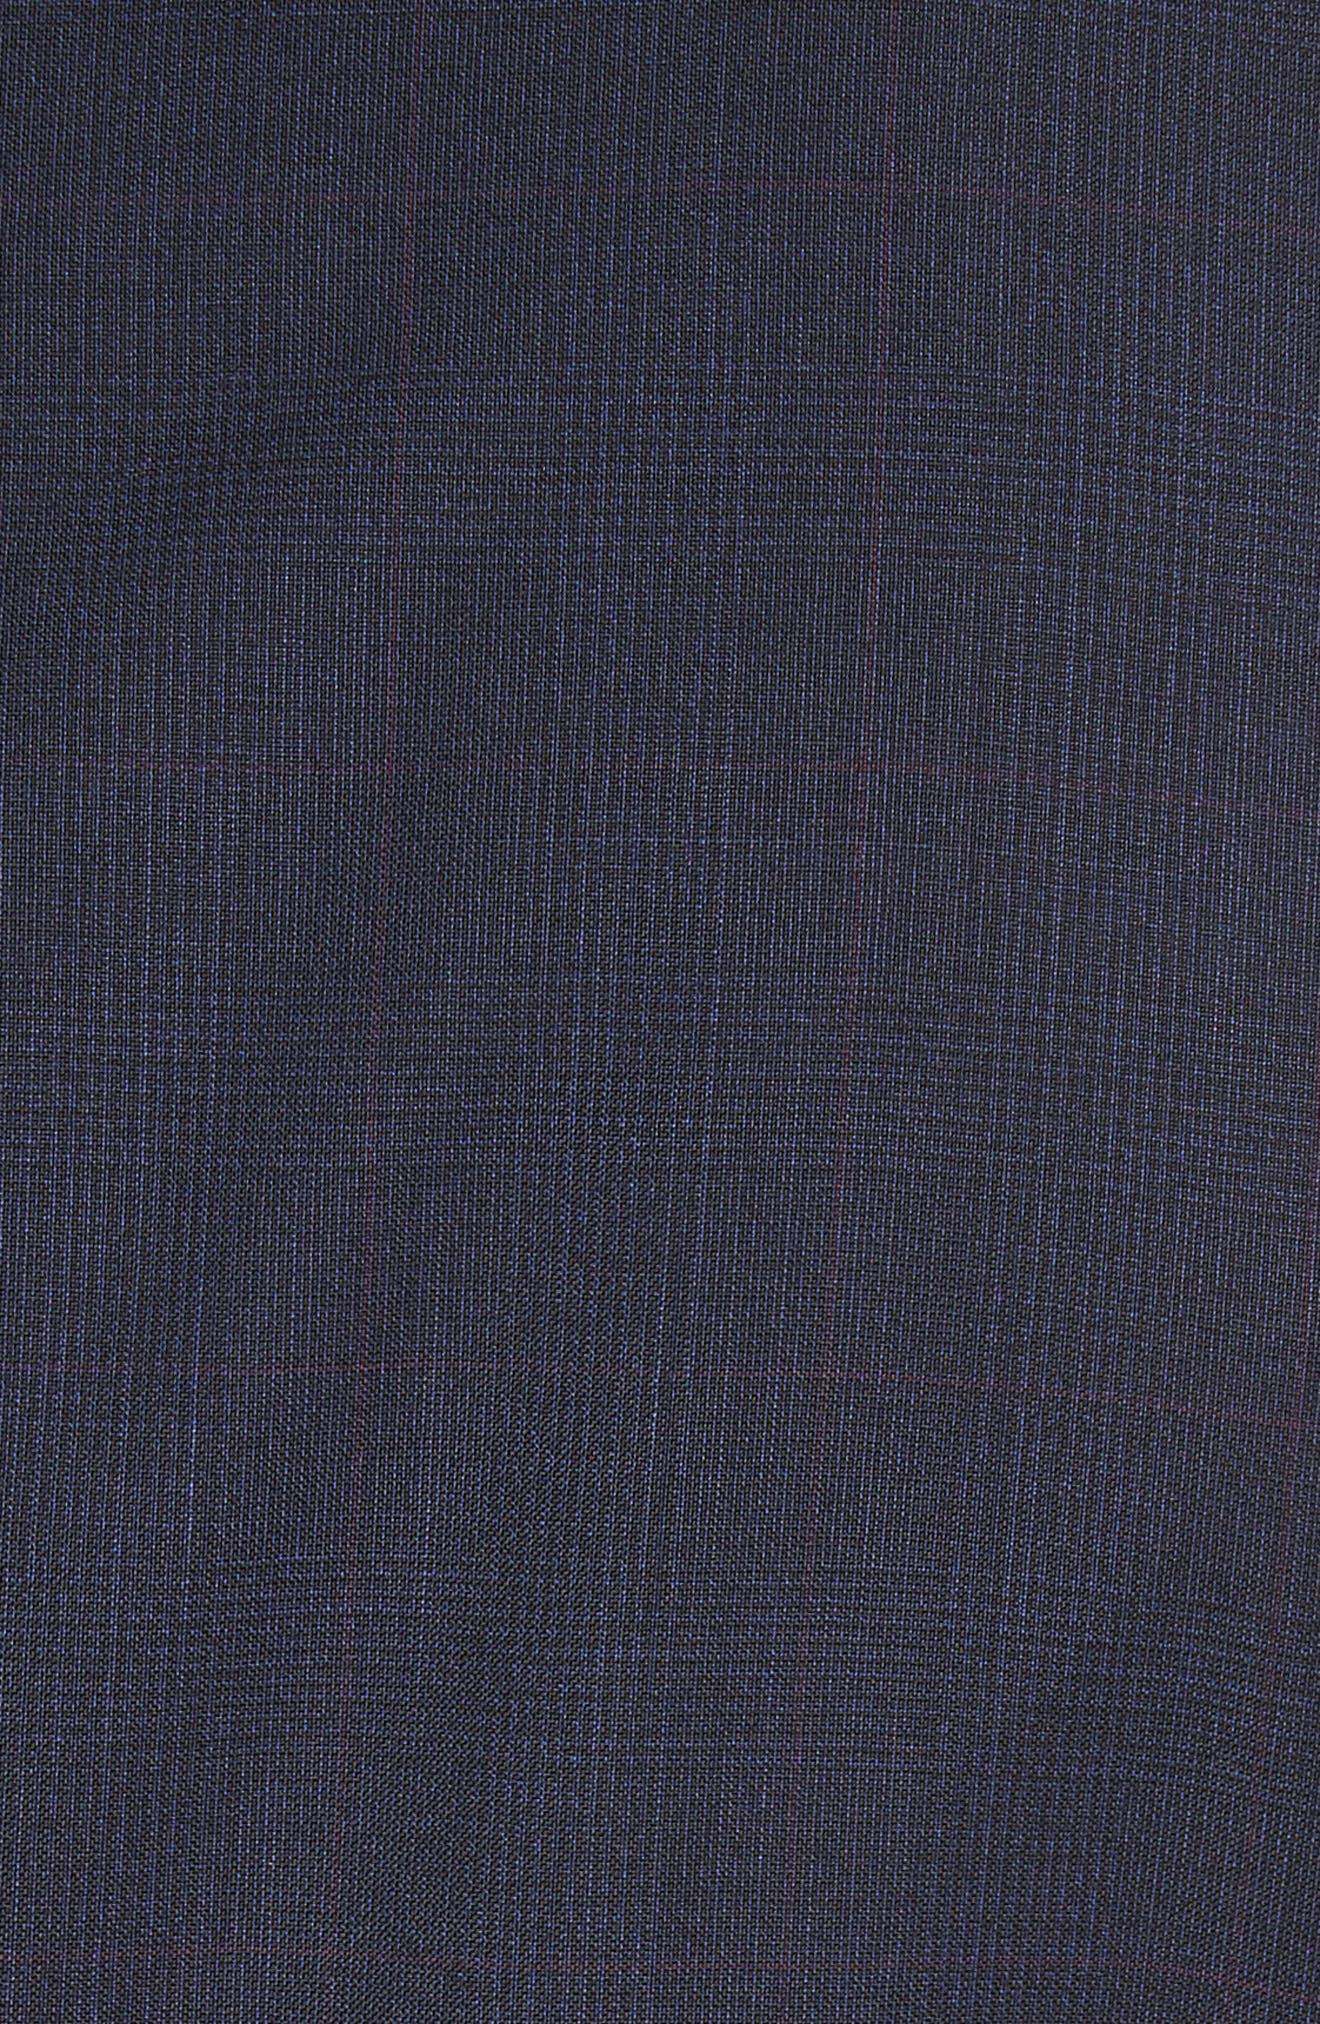 Classic Fit Check Wool Suit,                             Alternate thumbnail 7, color,                             416